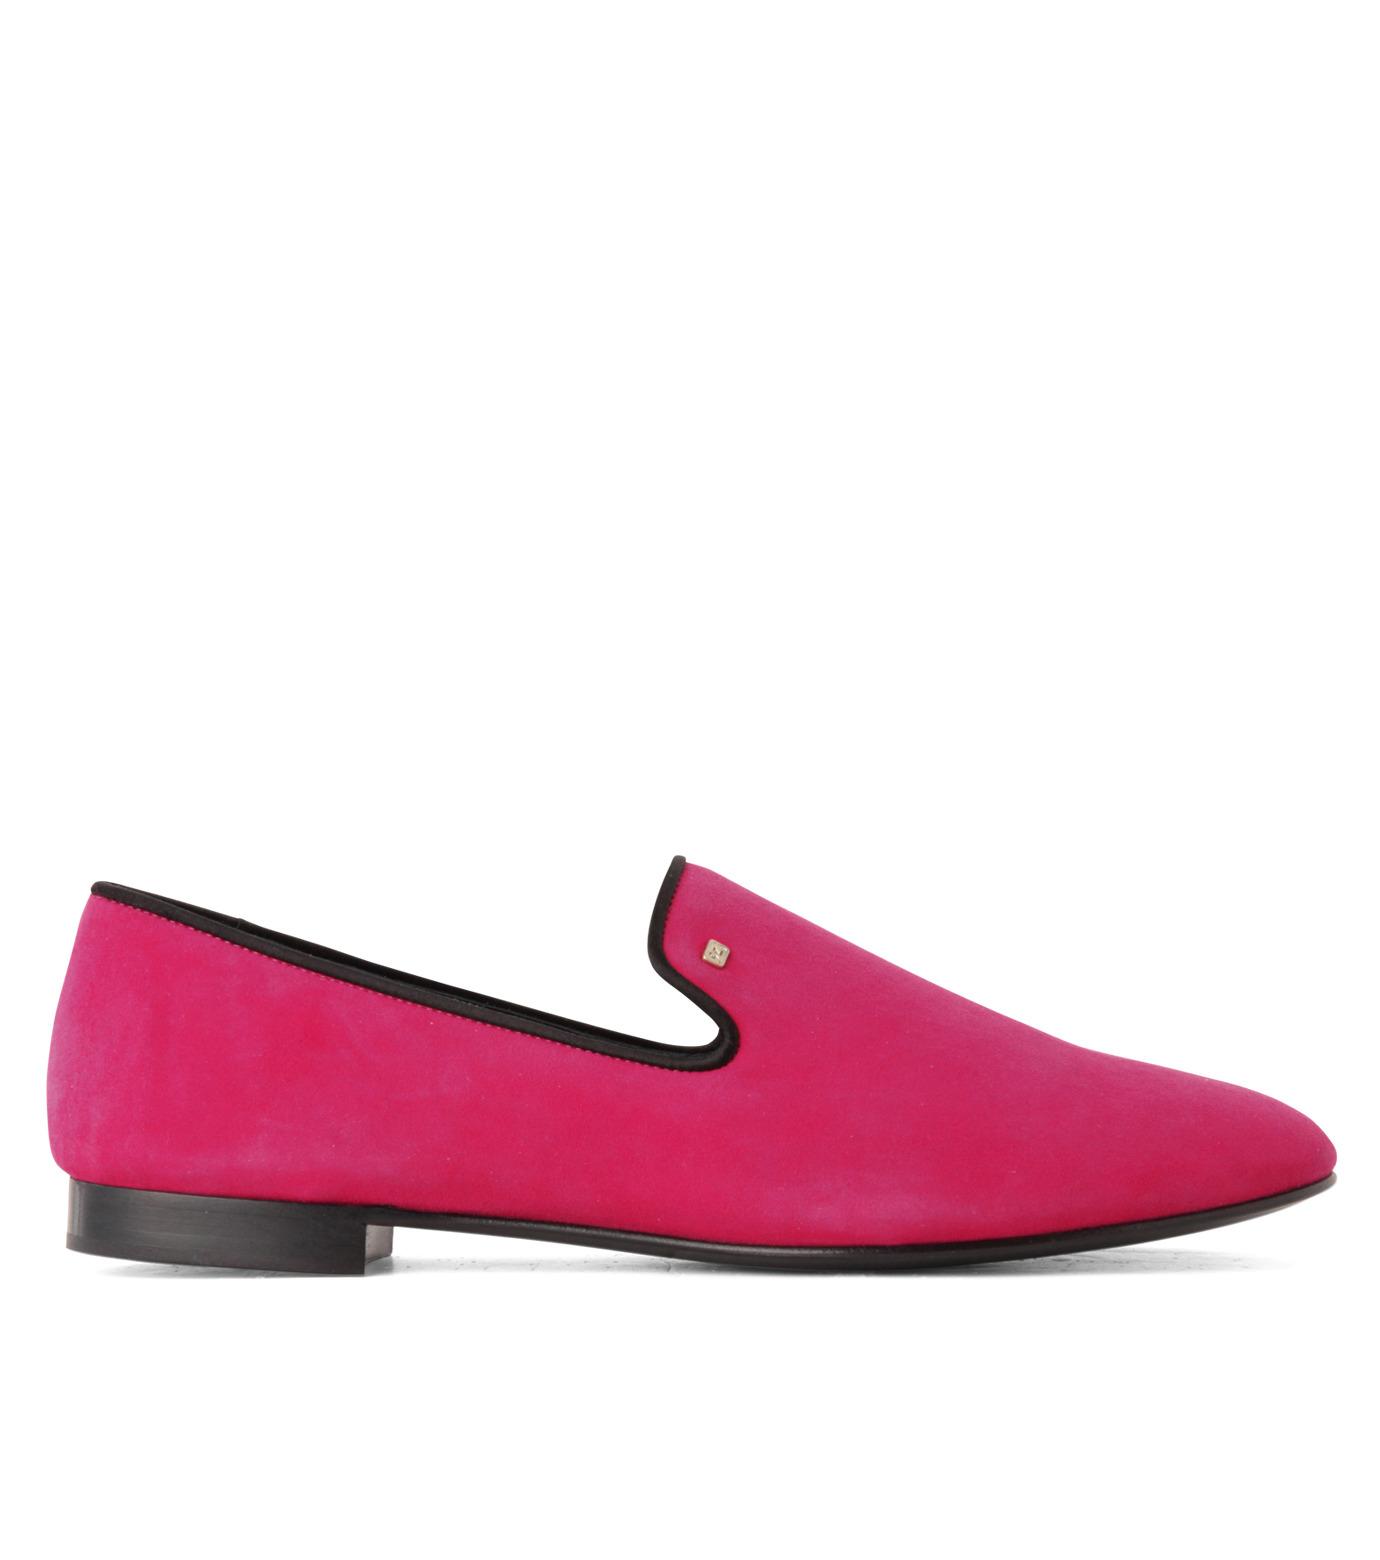 Giuseppe Zanotti Design(ジュゼッペザノッティ)のSuede Slipon-PINK(シューズ/shoes)-EU4010-CA5-72 拡大詳細画像1